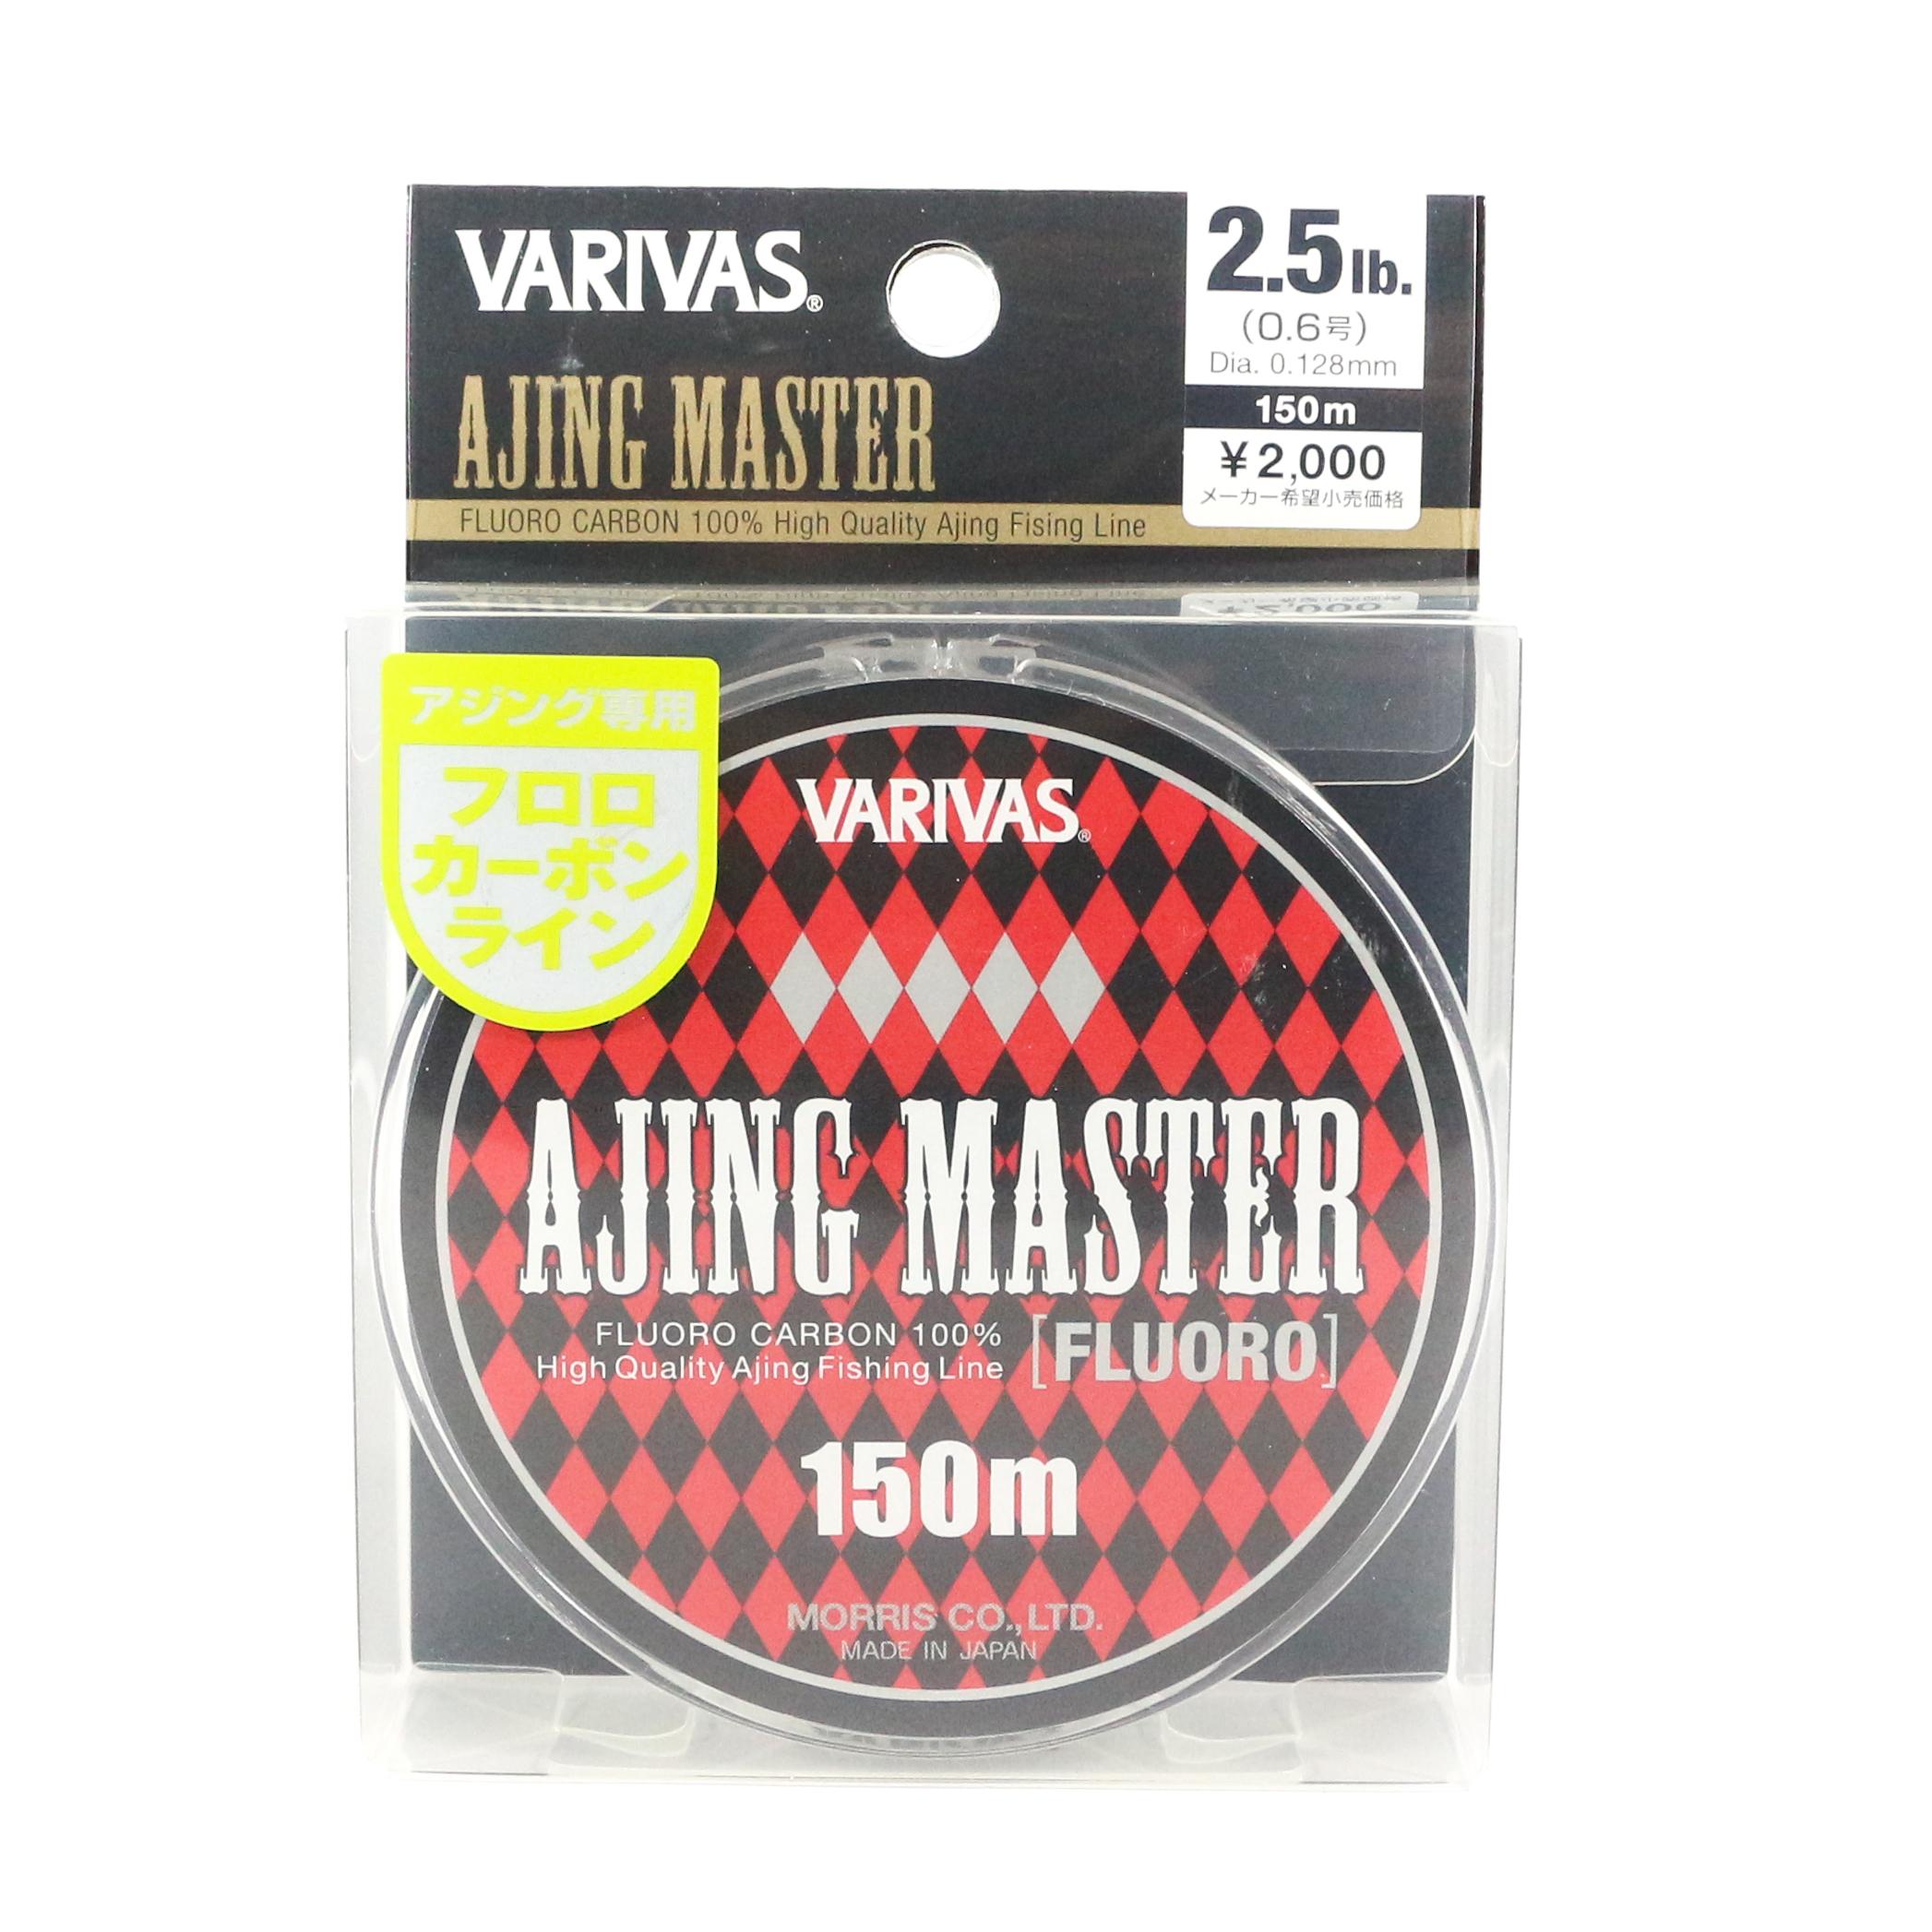 Sale Varivas Fluorocarbon Line Ajing Master 150m P.E 0.6, 2.5lb (5178)